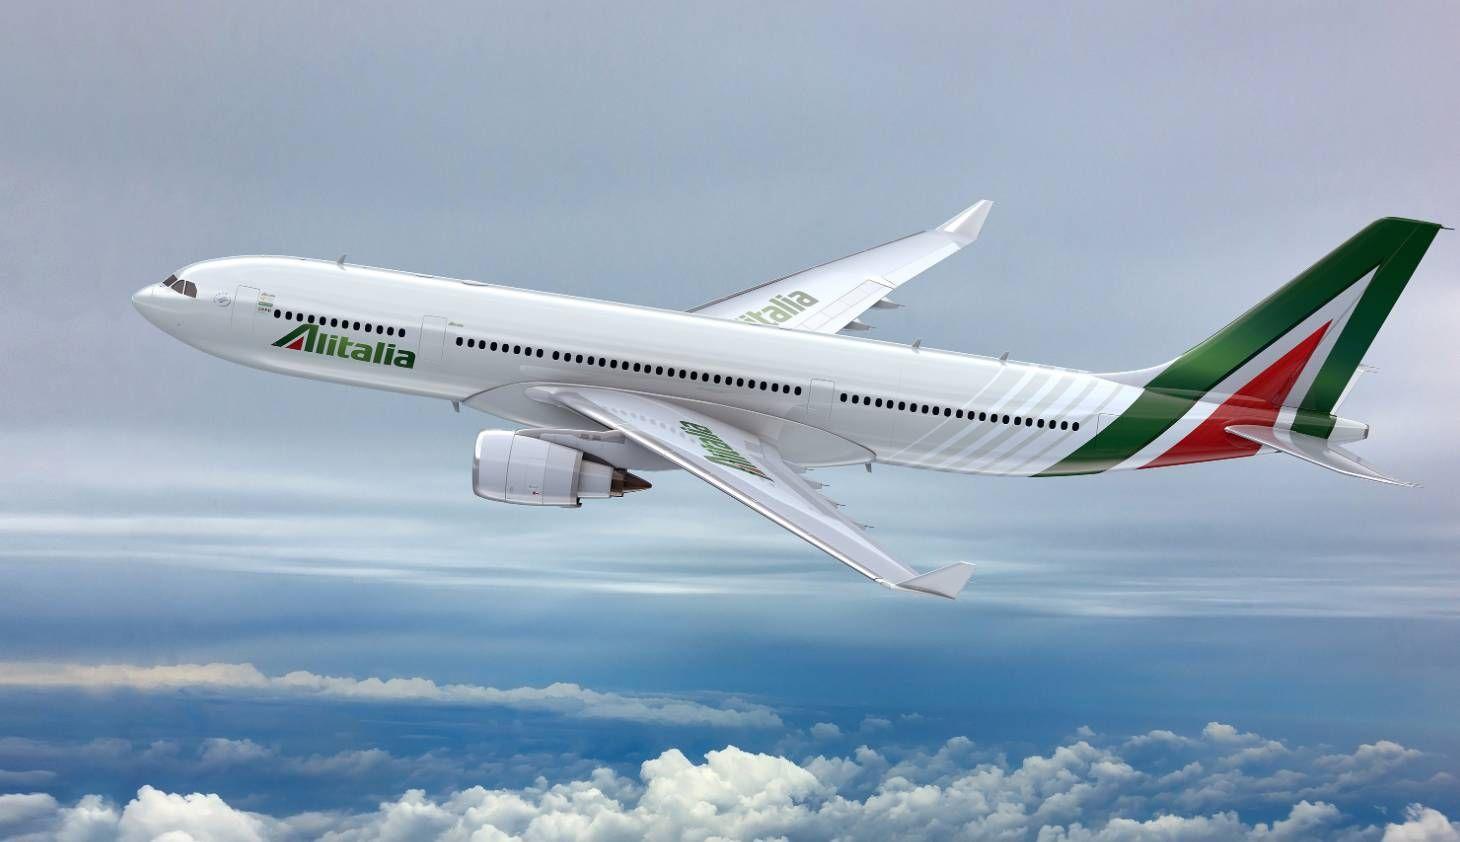 Alitalia deixará de voar diariamente para o Rio de Janeiro